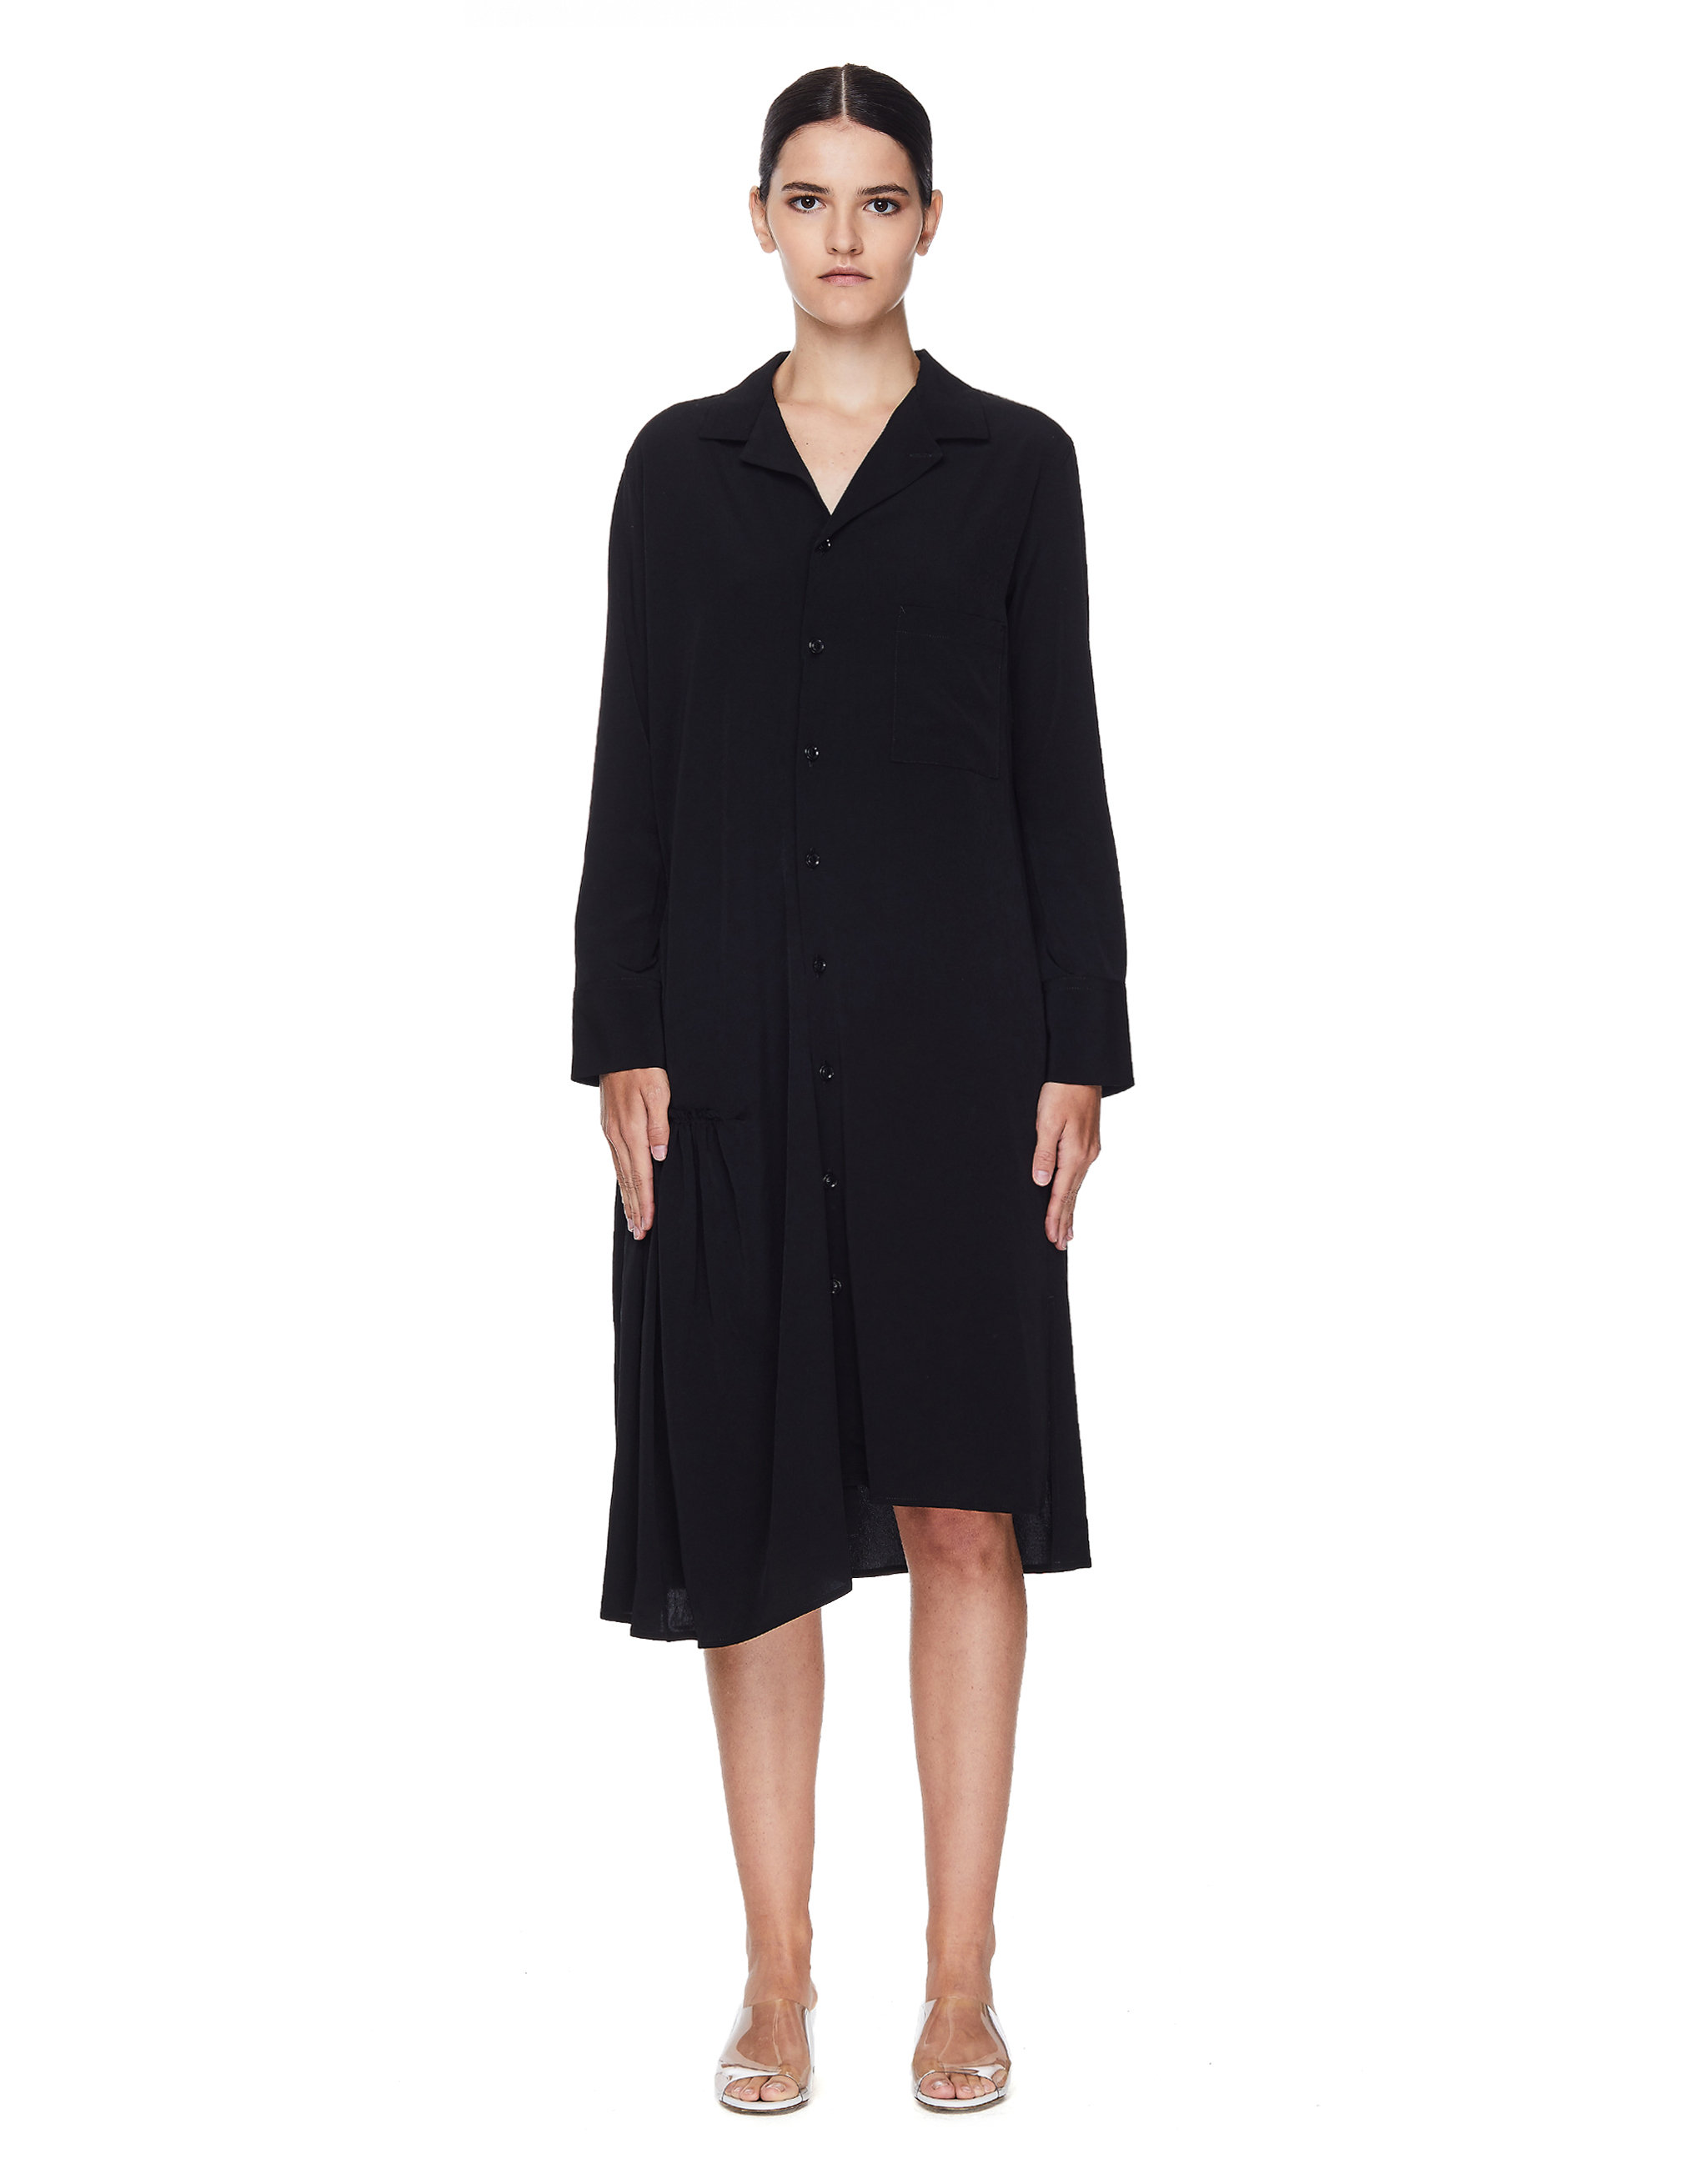 Y's Black Buttoned Dress